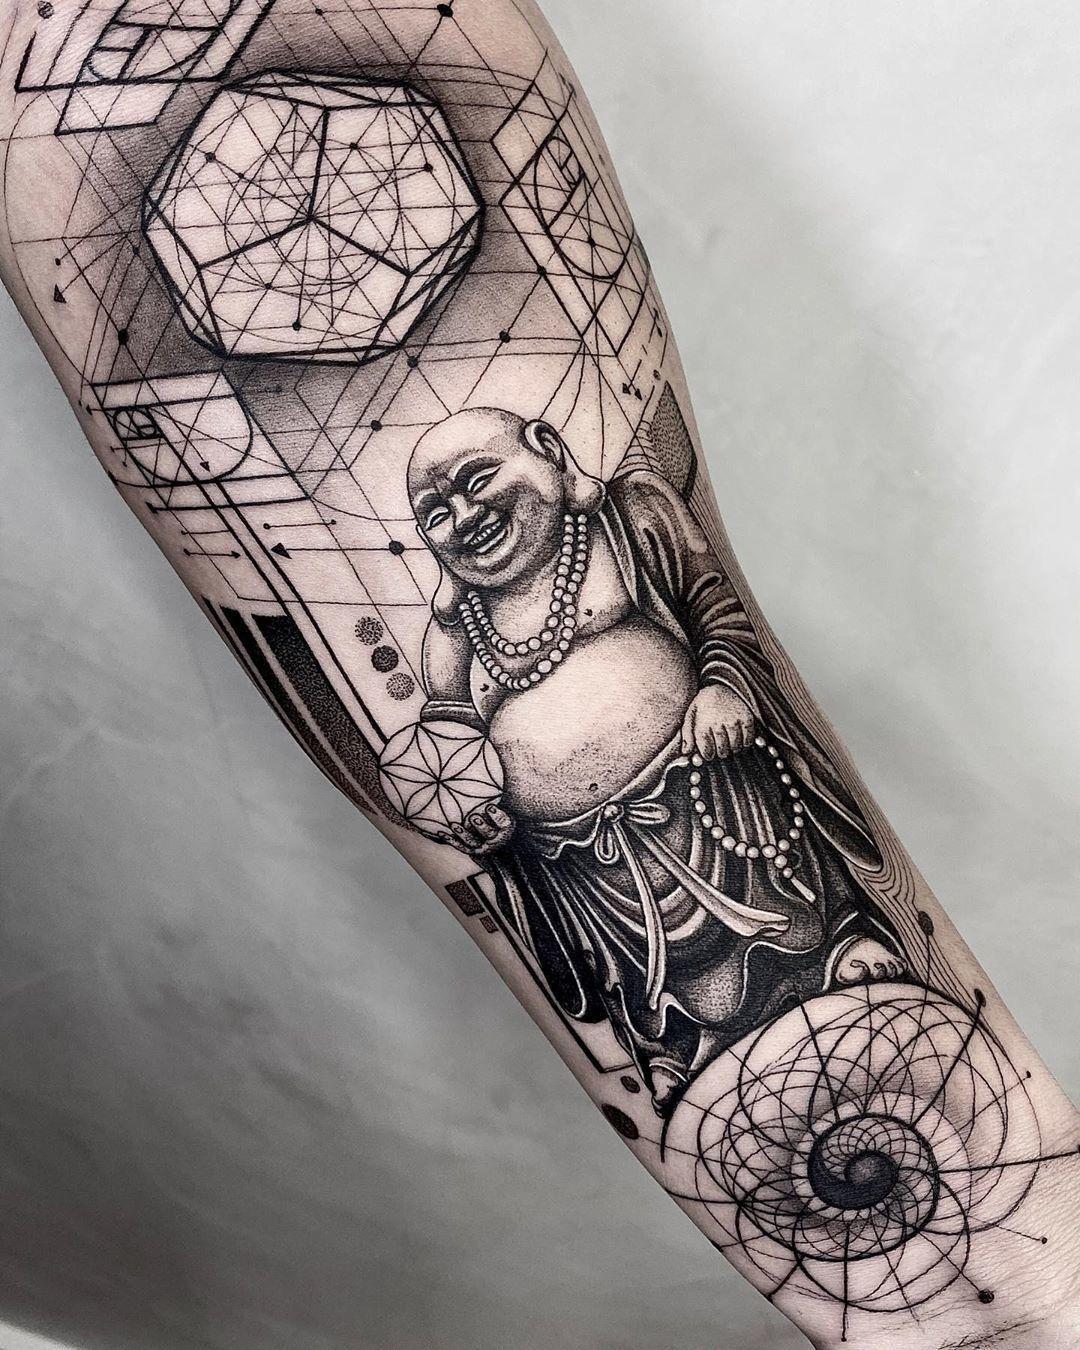 Tattoodo On Instagram Buddha Tattoo Made By Raphafons In Rio De Janeiro Brazil Tattoodo In 2020 Tattoos